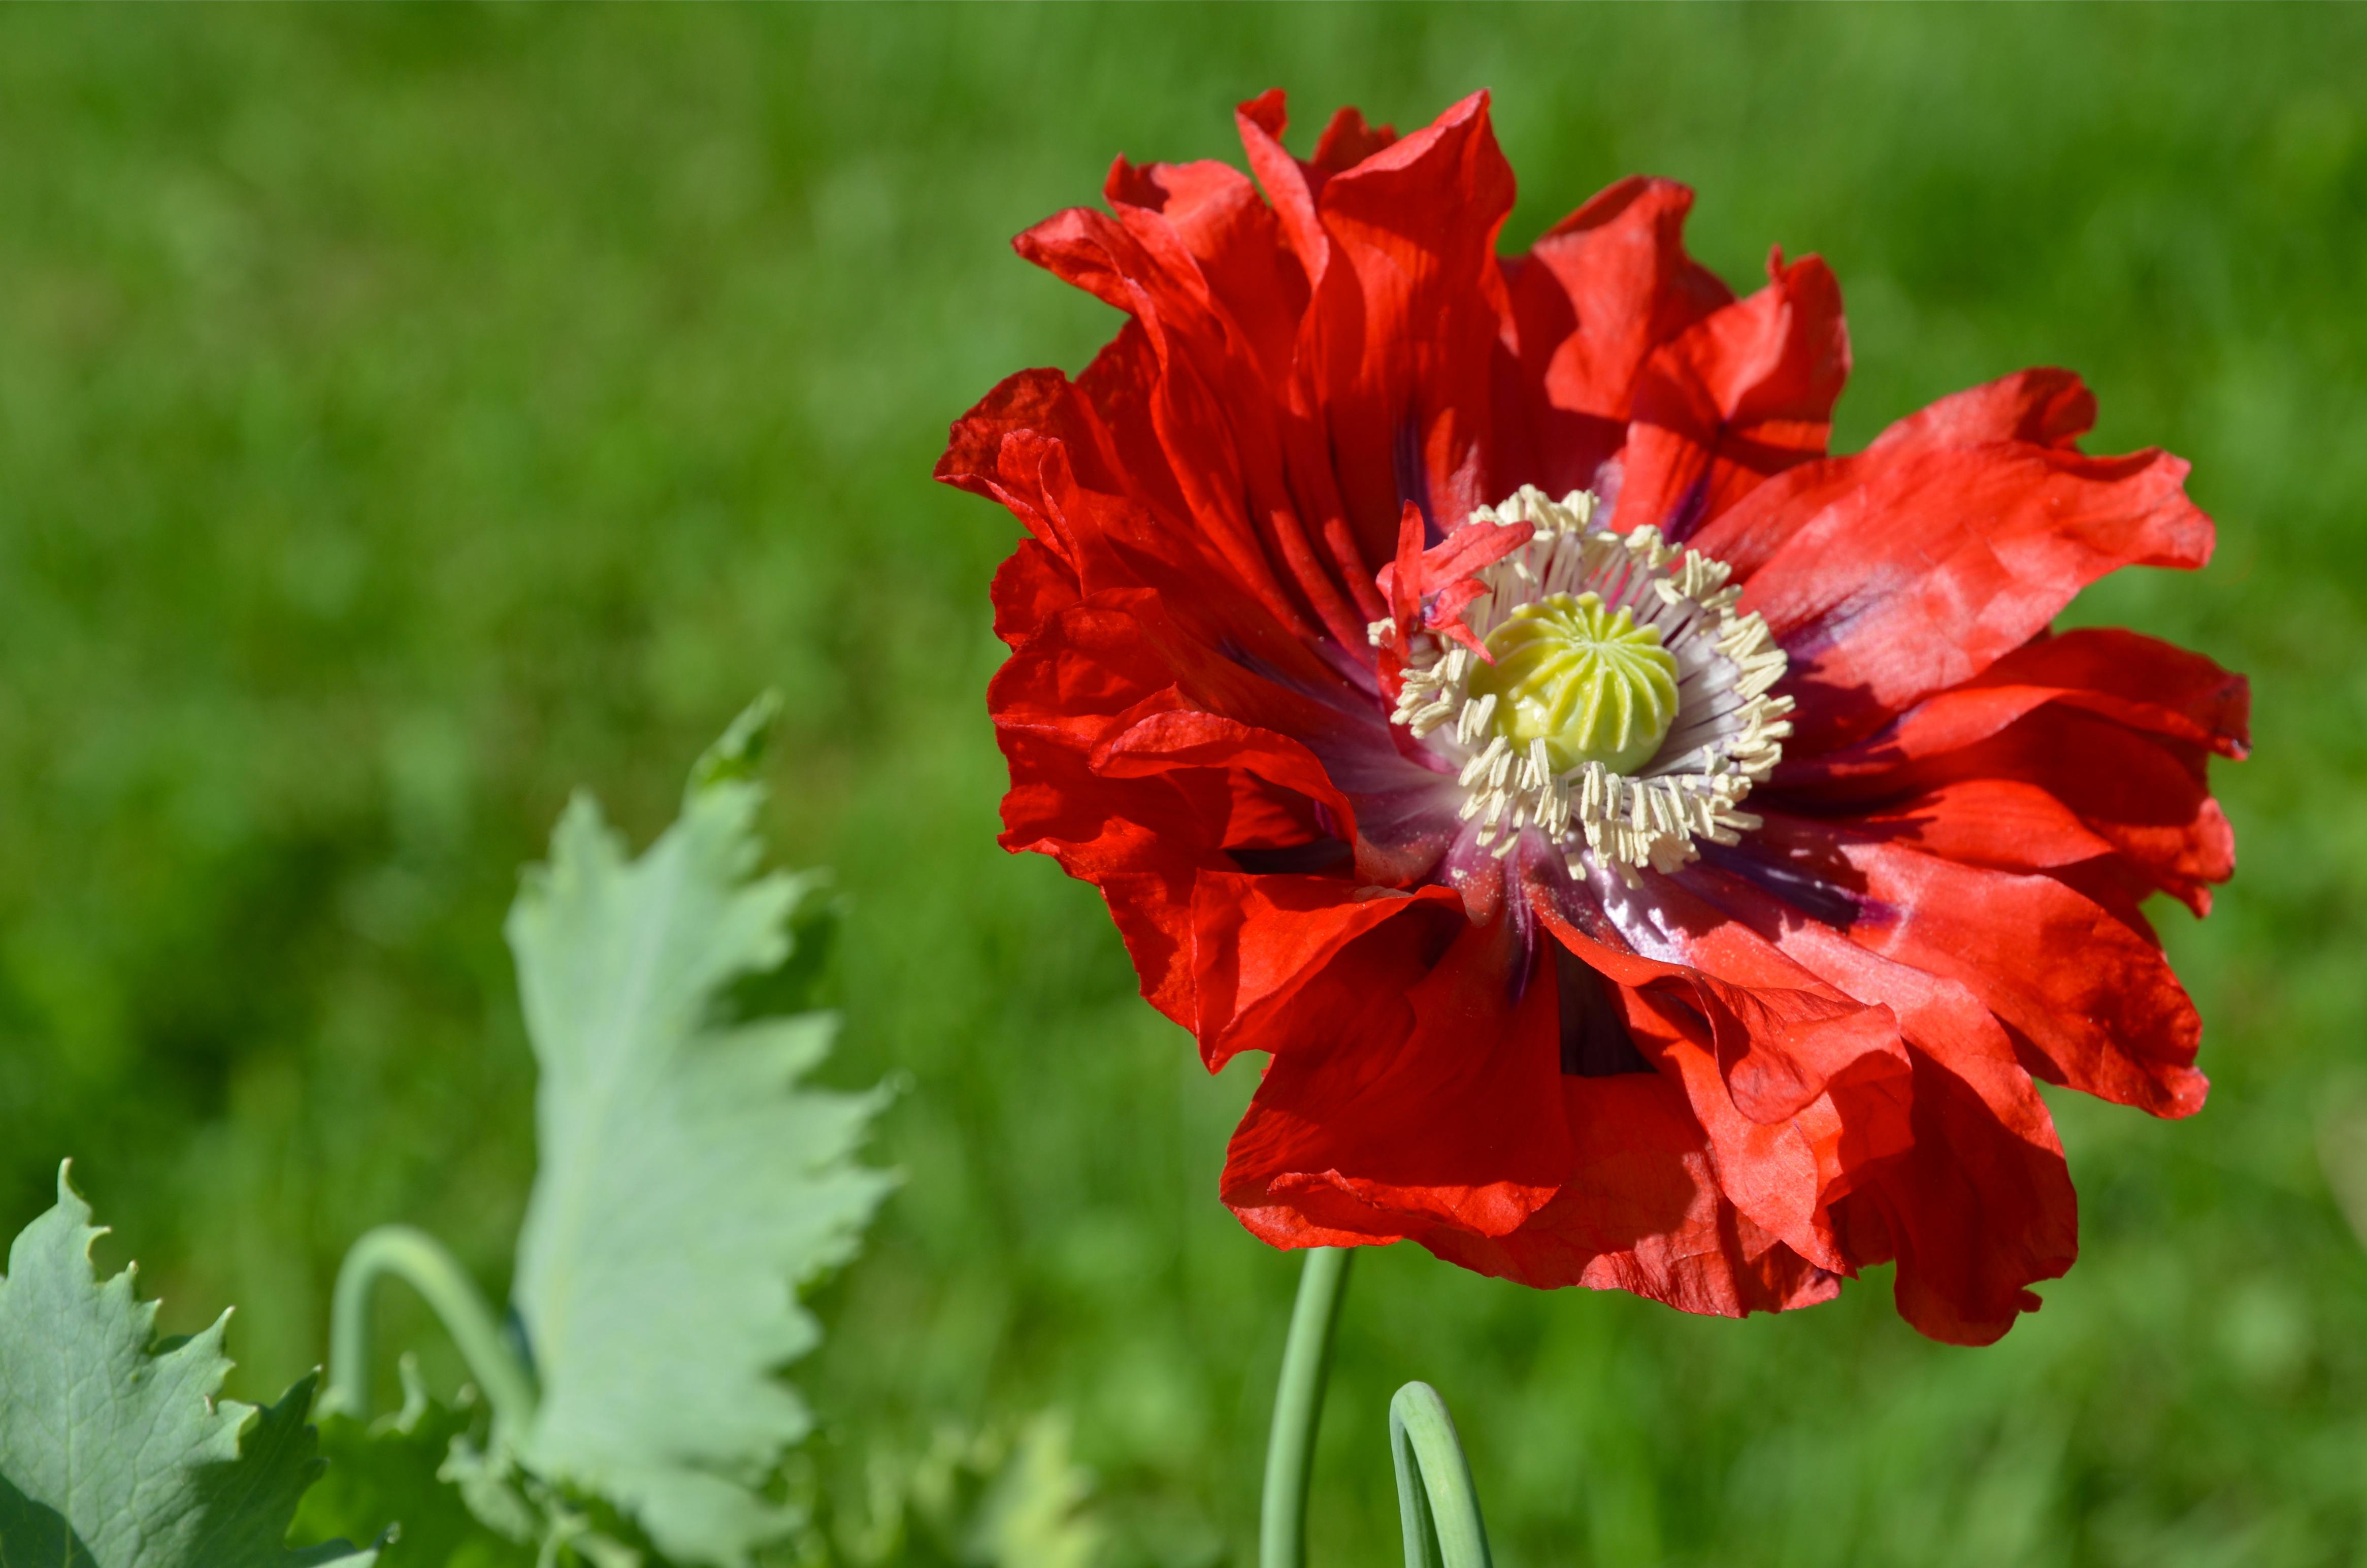 Red Poppy, by Jill Piper (Atea Ring Gallery, Westport, NY)